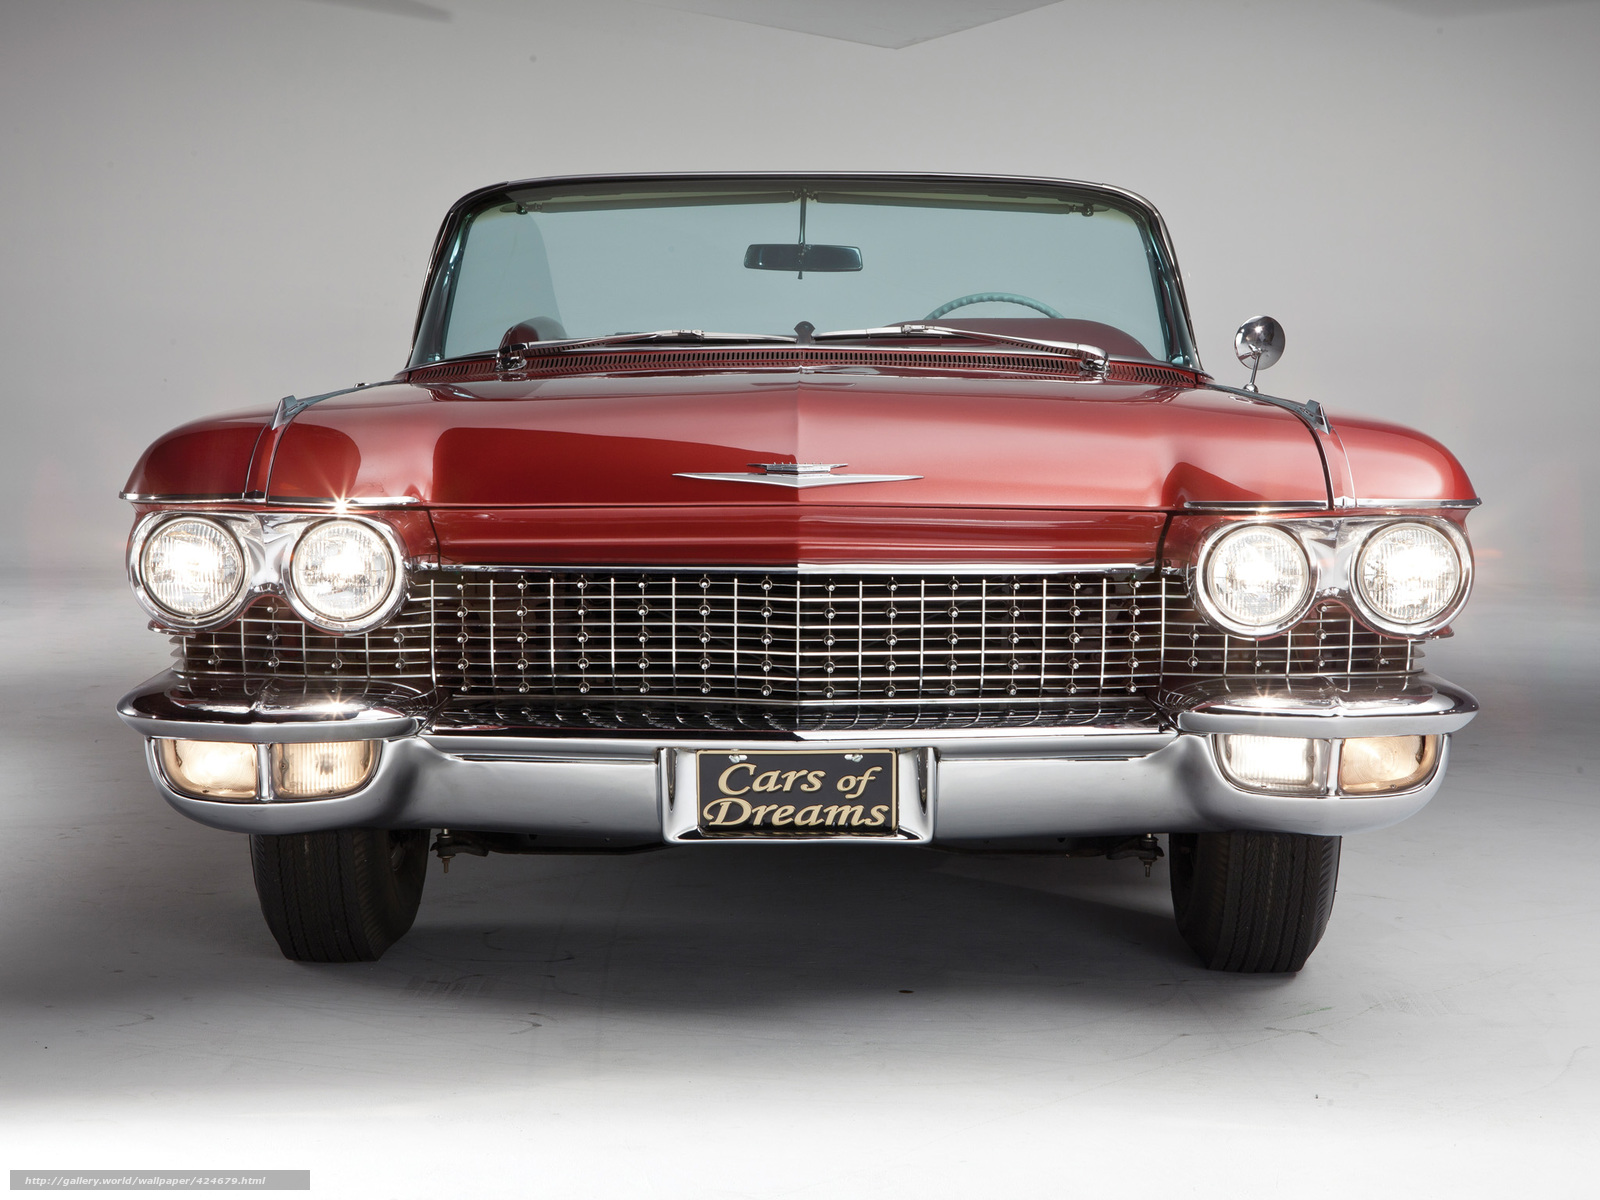 Cadillac Sfondi Gratis